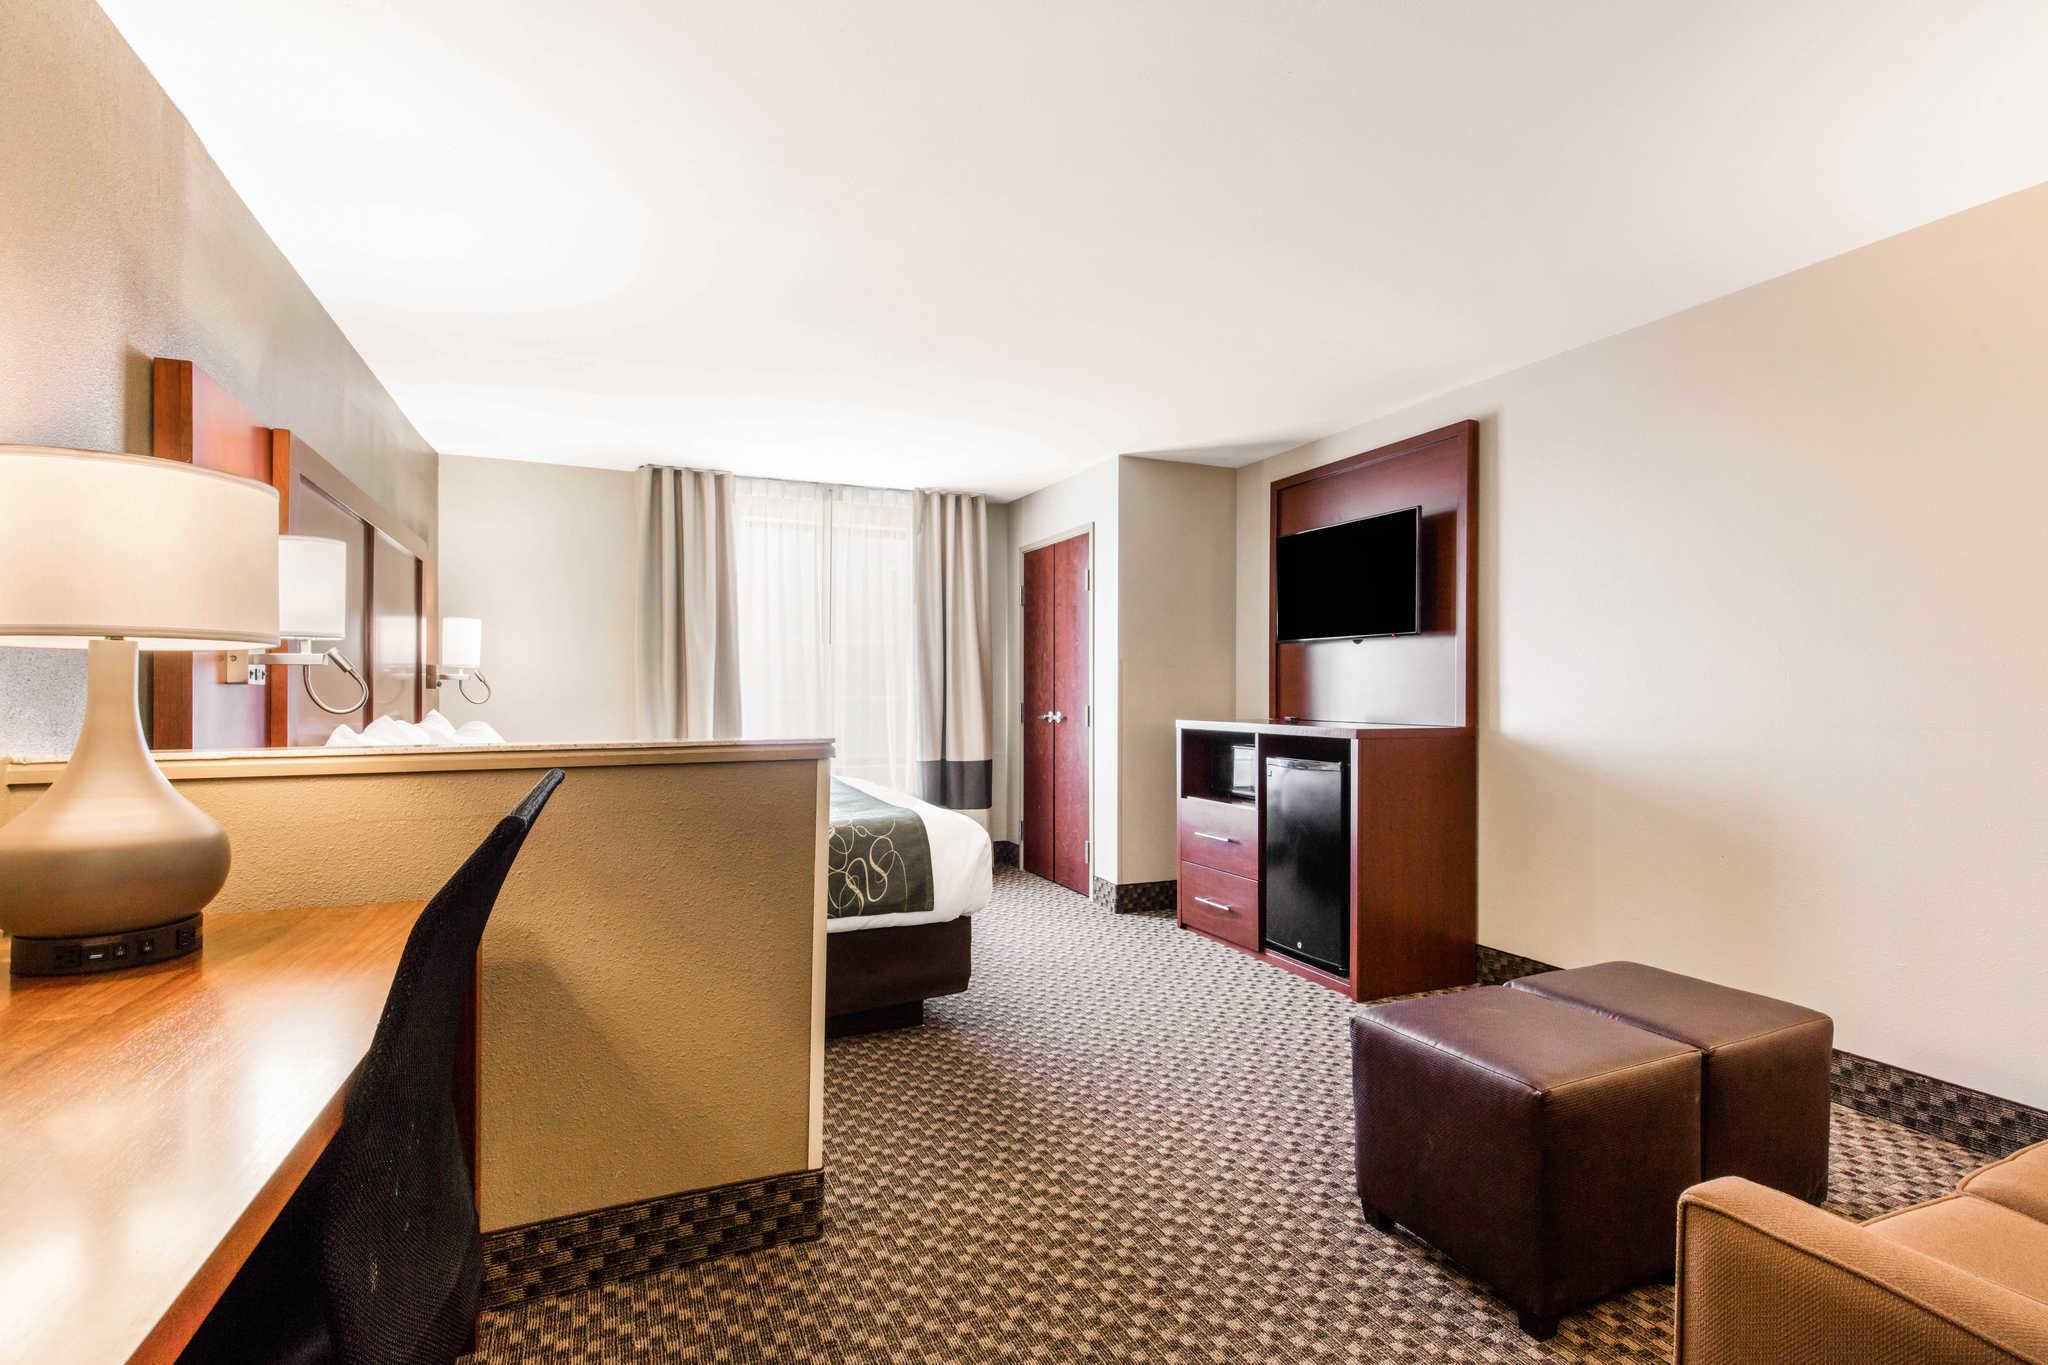 Comfort Suites image 20